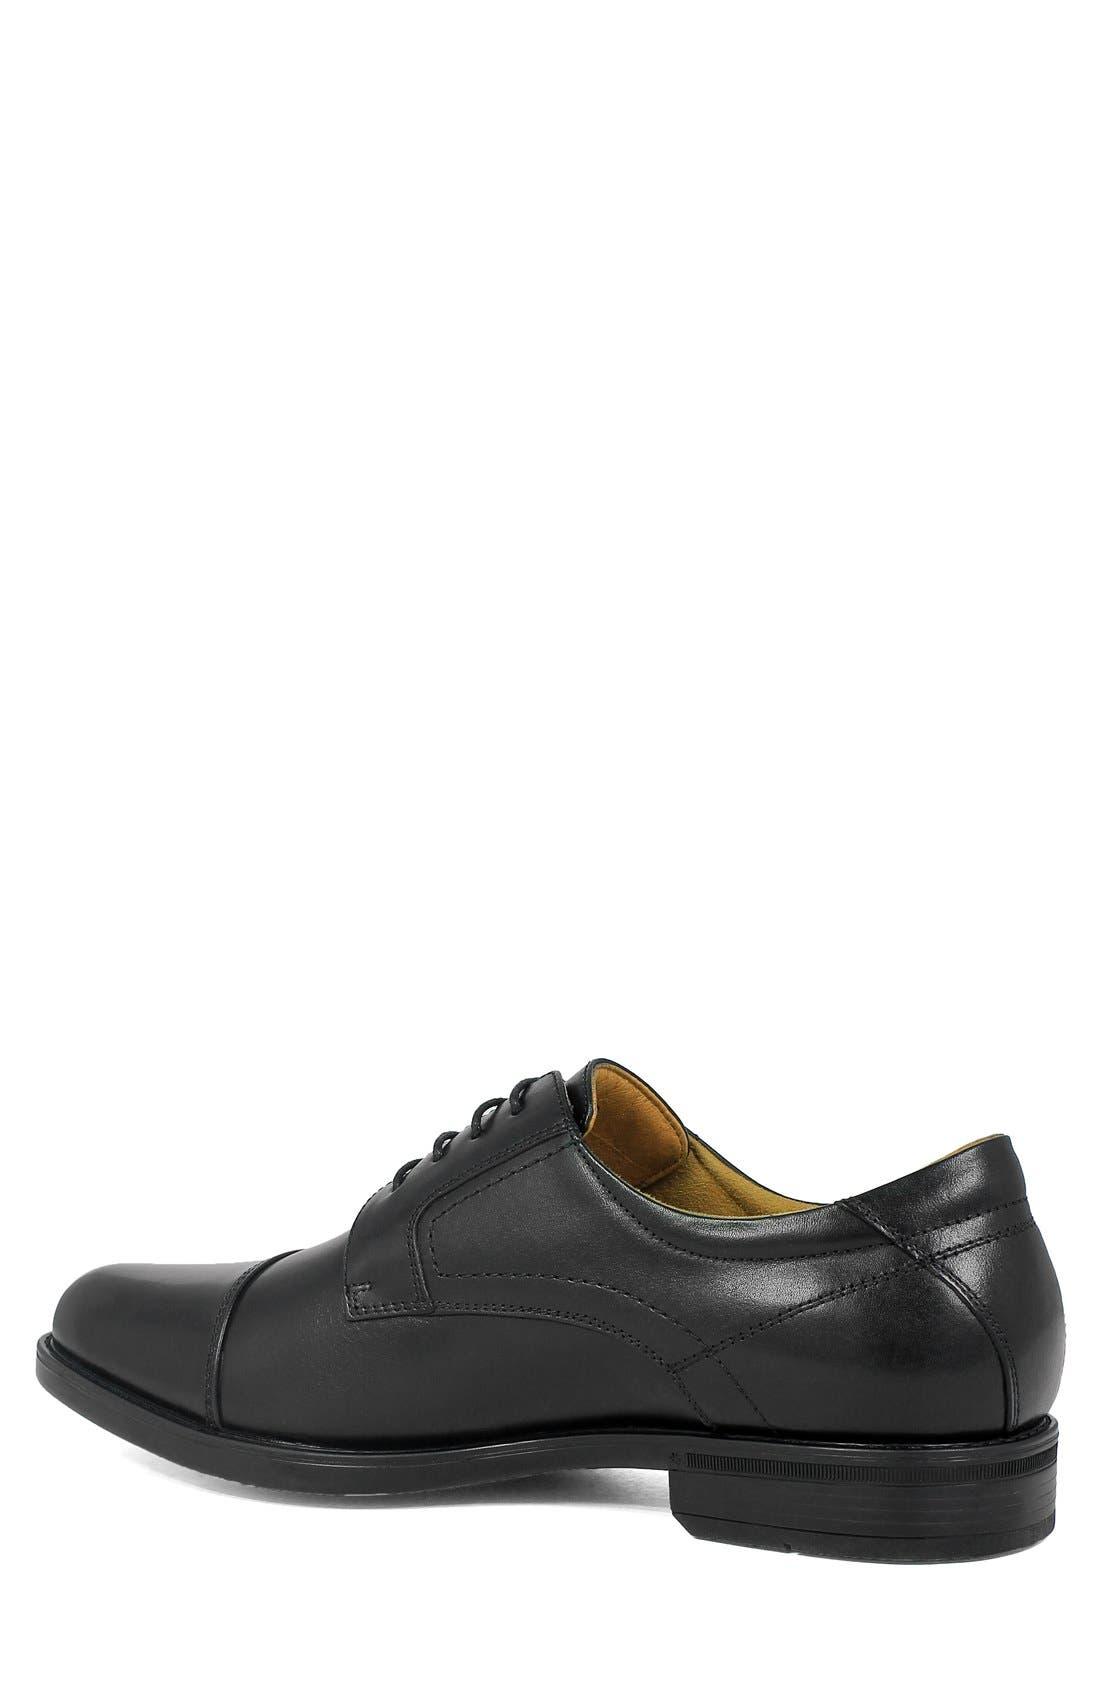 'Midtown' Cap Toe Derby,                             Alternate thumbnail 2, color,                             Black Leather